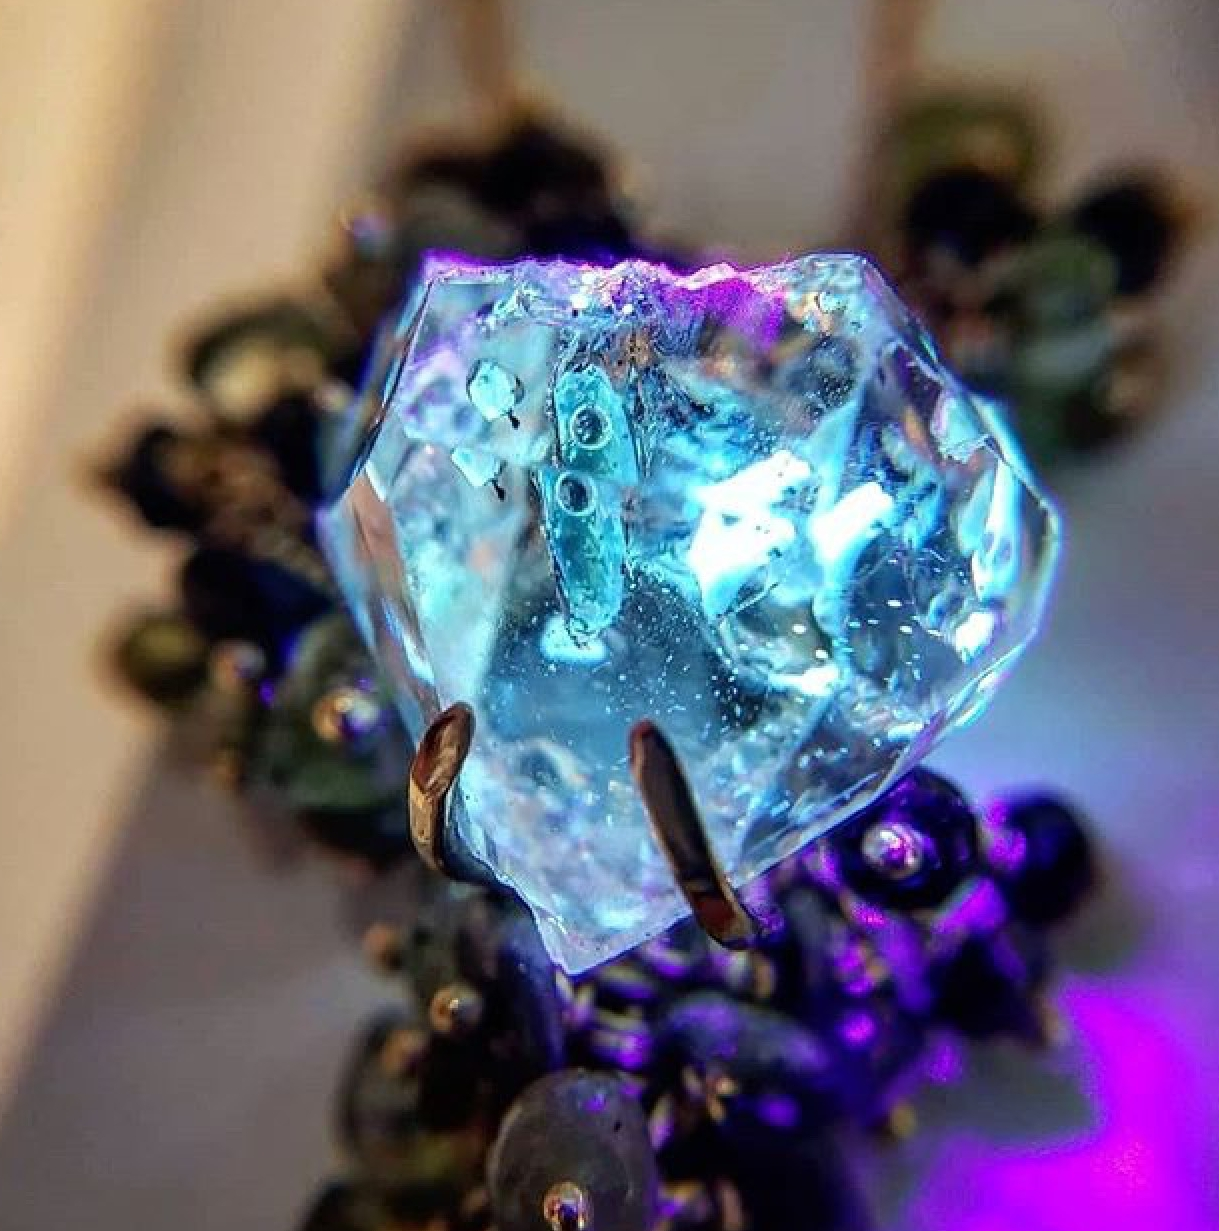 Detail of the golden enhydro quartz in Michelle Pajak-Reynolds's Desma pendant fluorescing under UV light. Photo courtesy: Benjamin Guttery/Third Coast Gems